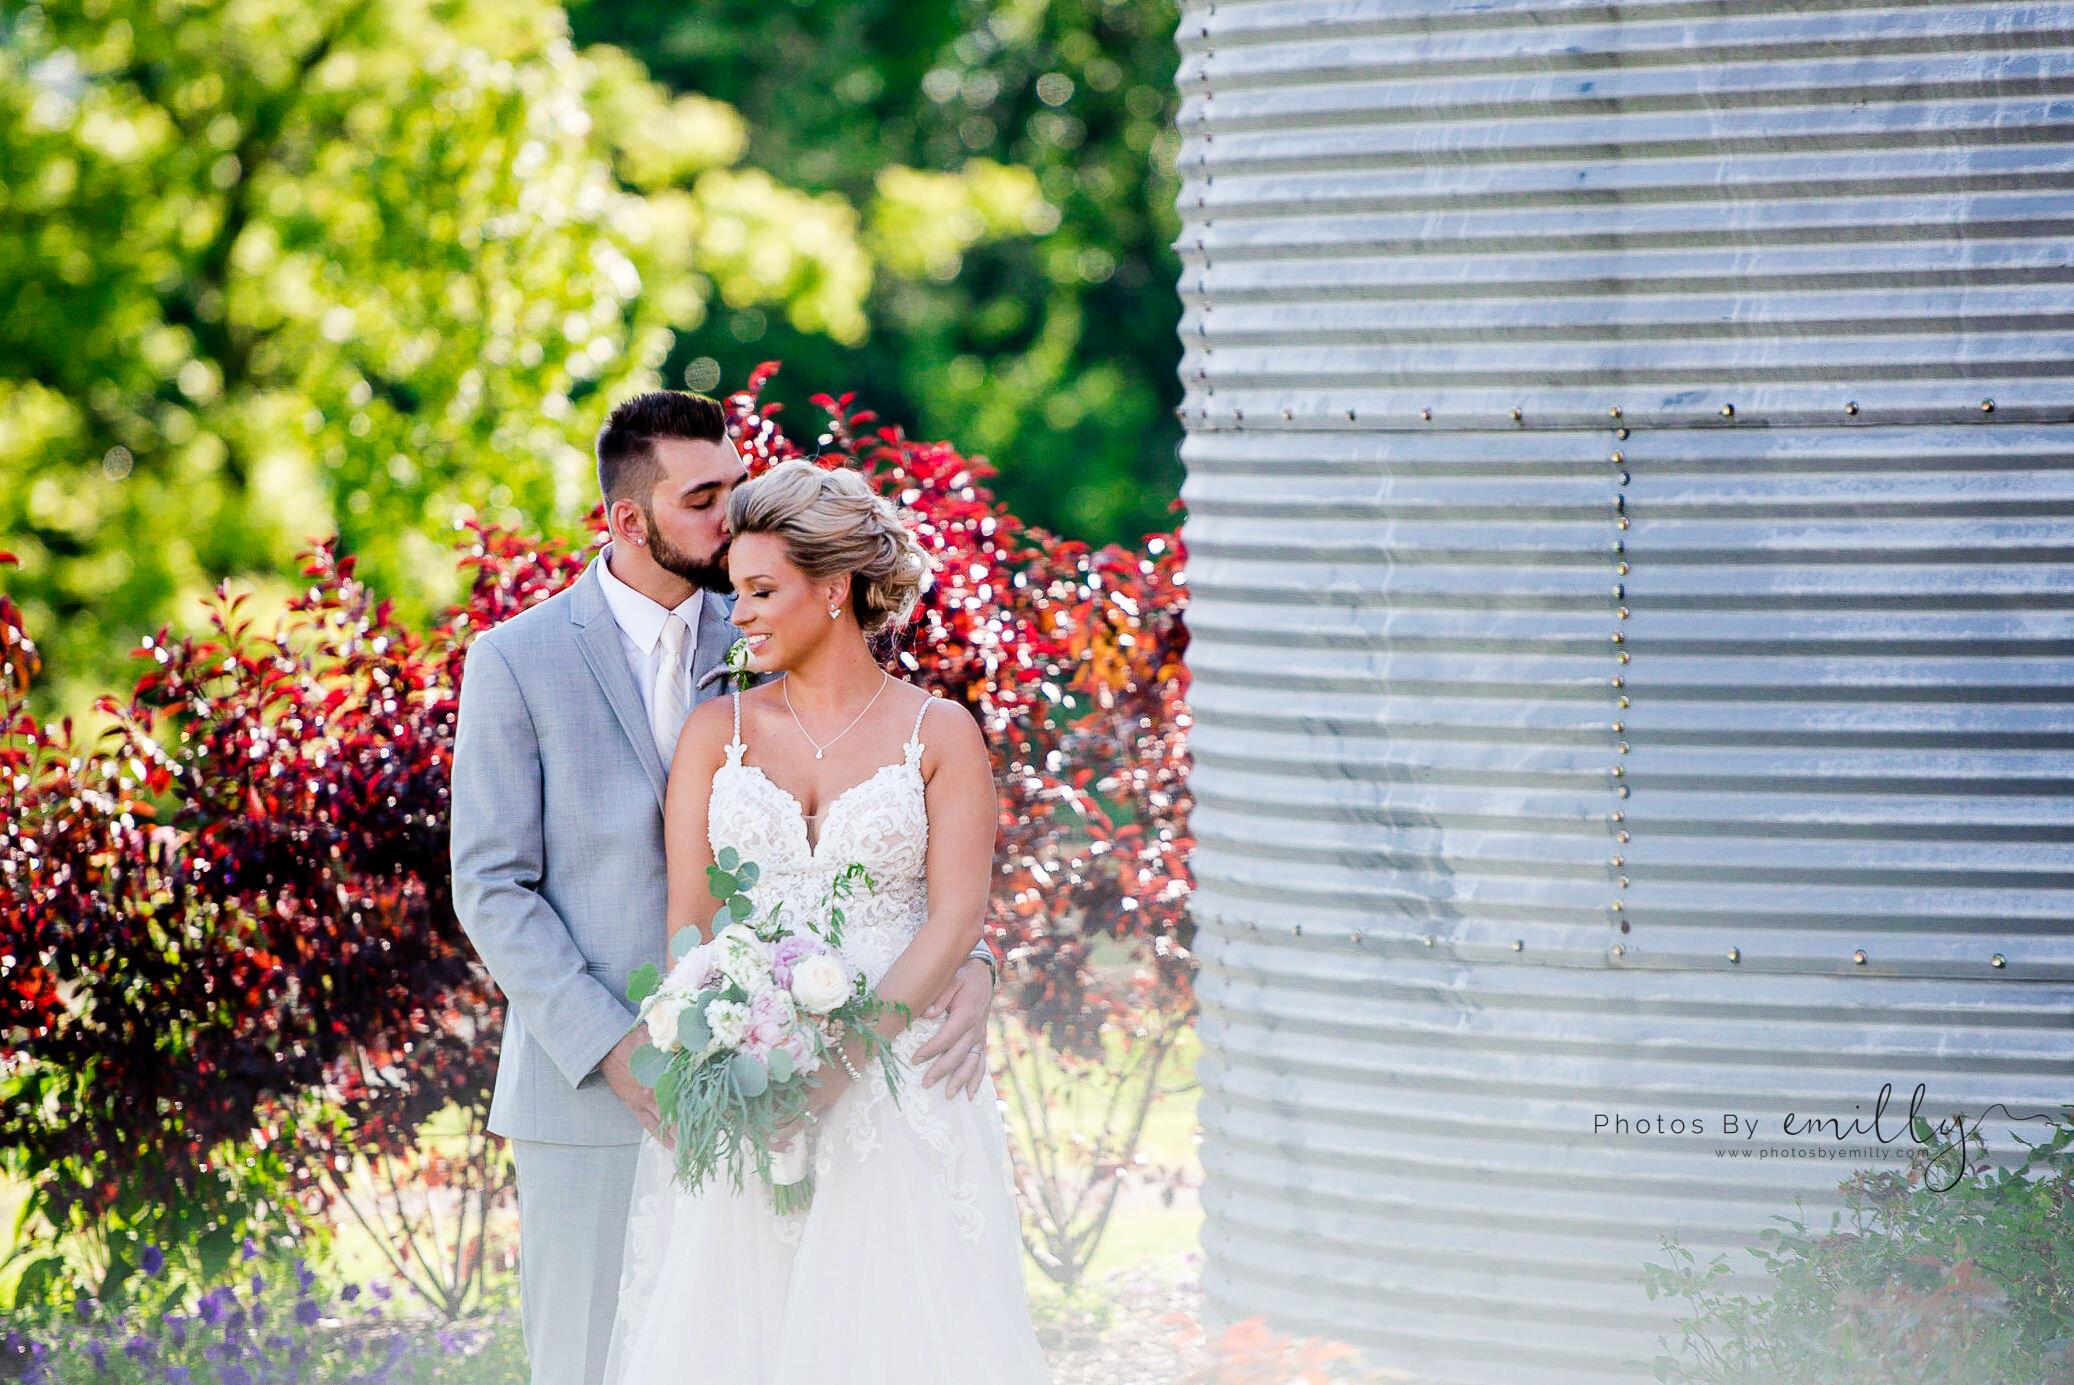 Photos by Emilly - LONG Wedding (28).jpg